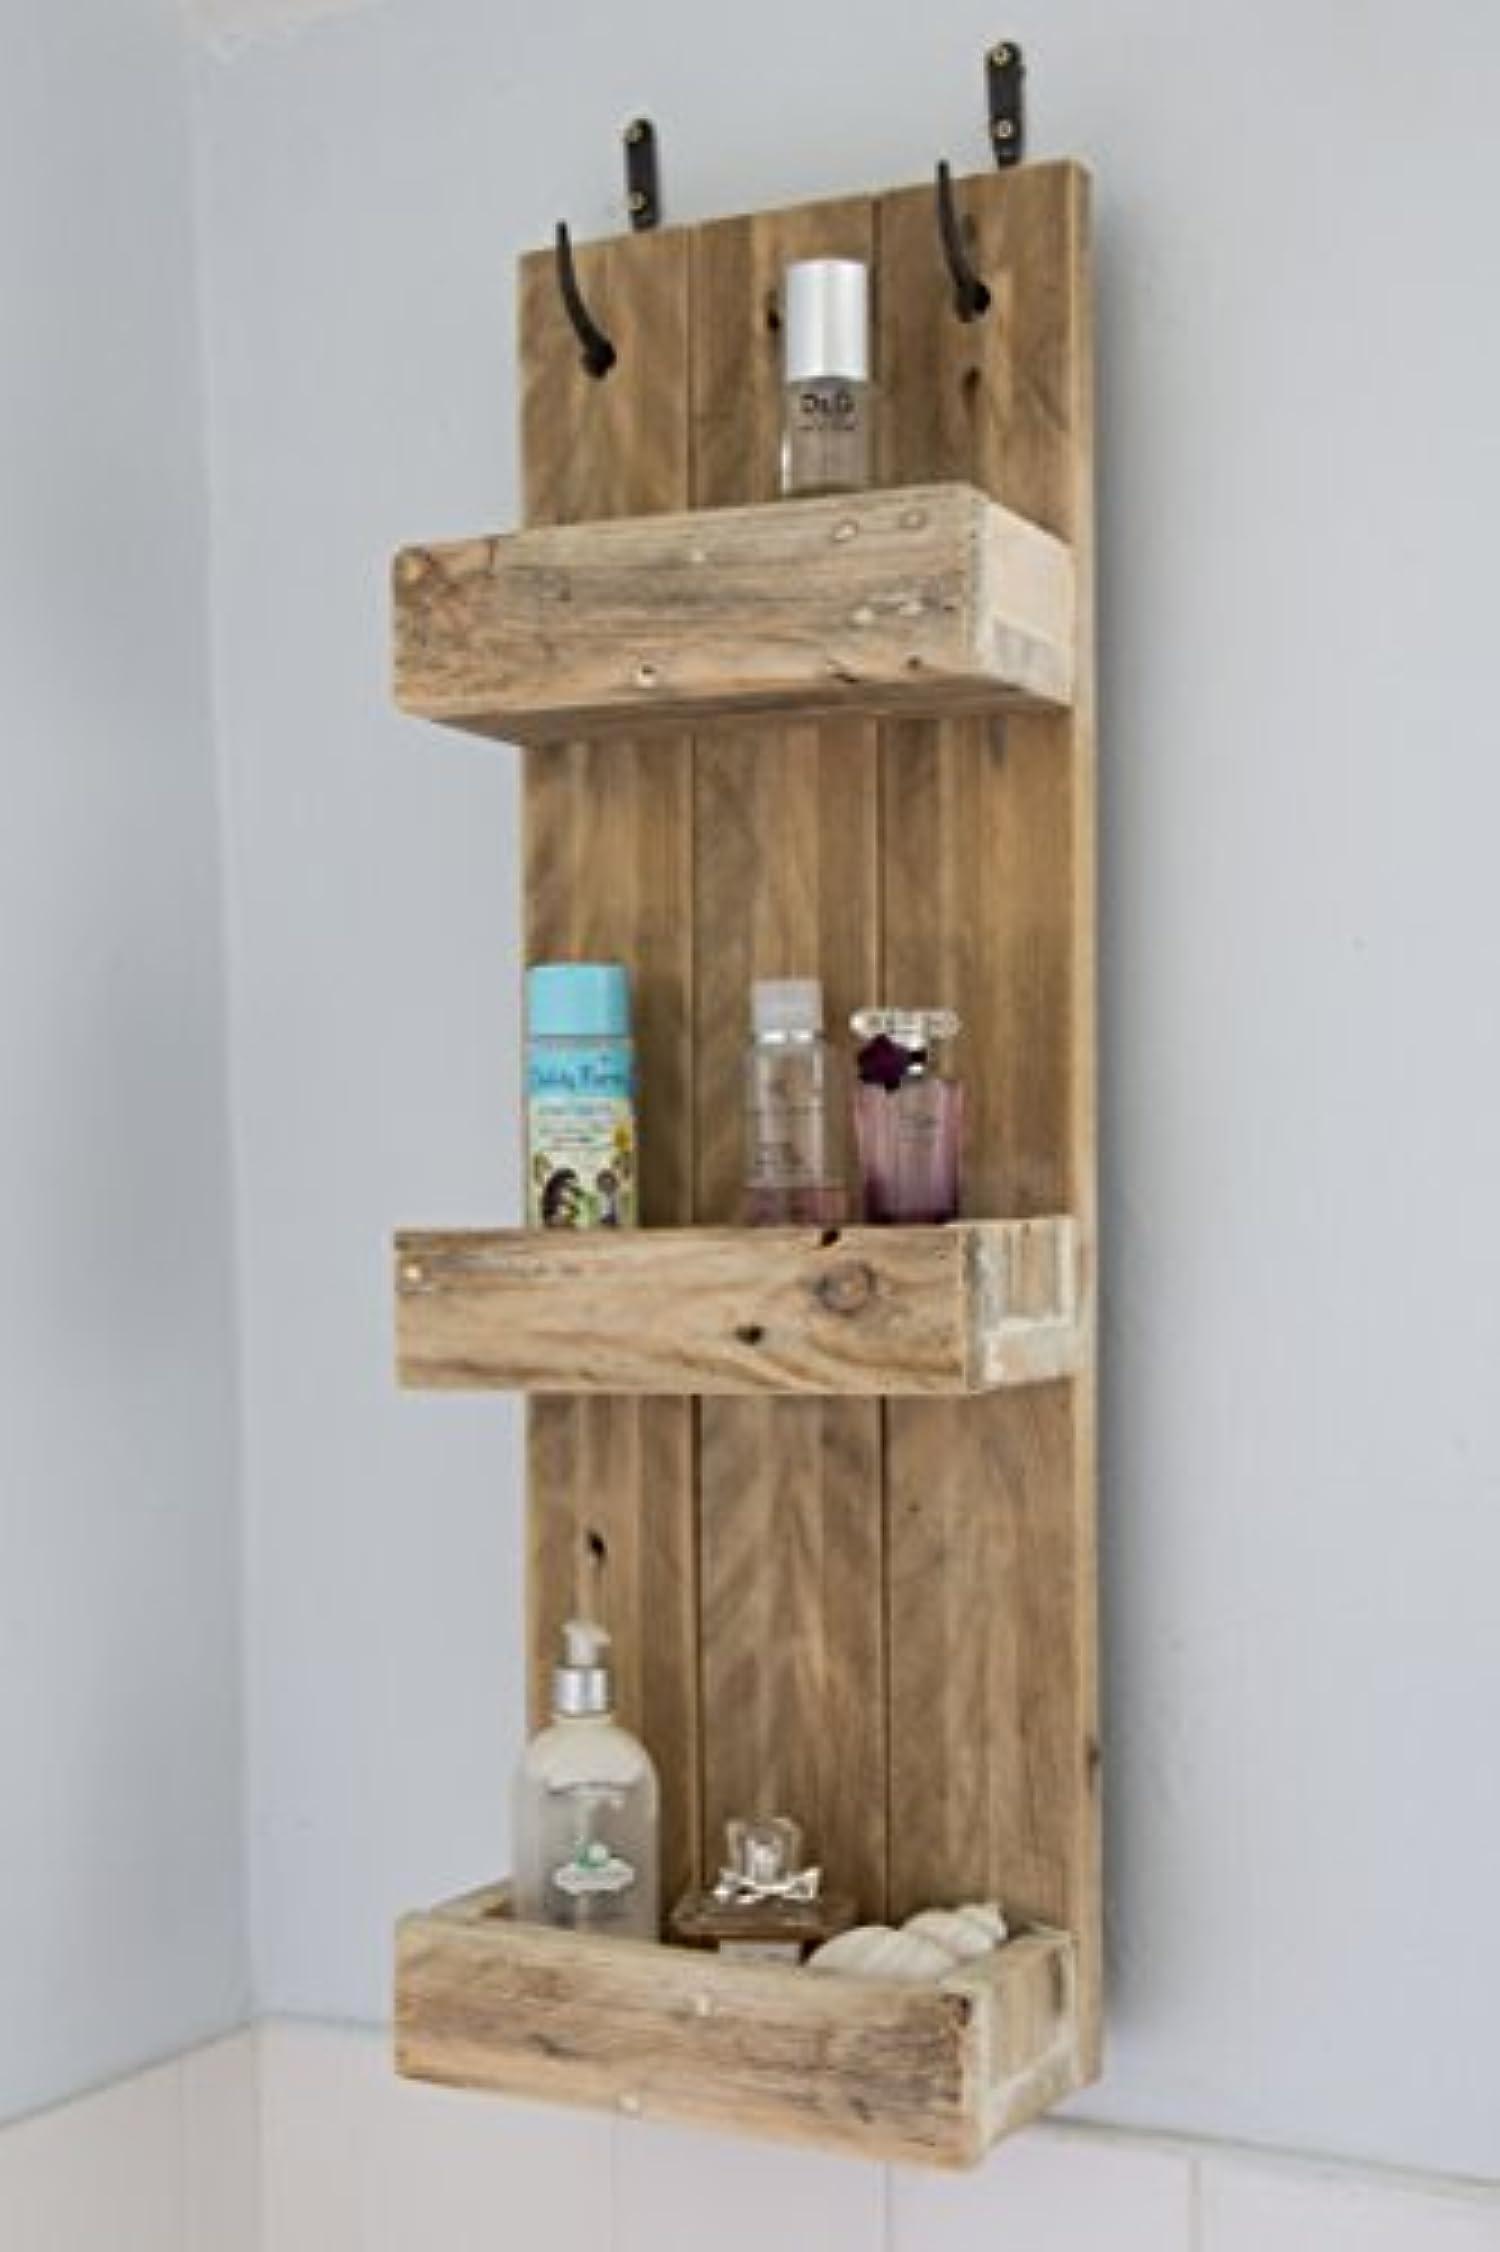 Rustic Bathroom Shelves Made From Reclaimed Pallet Wood By Pallet Genesis